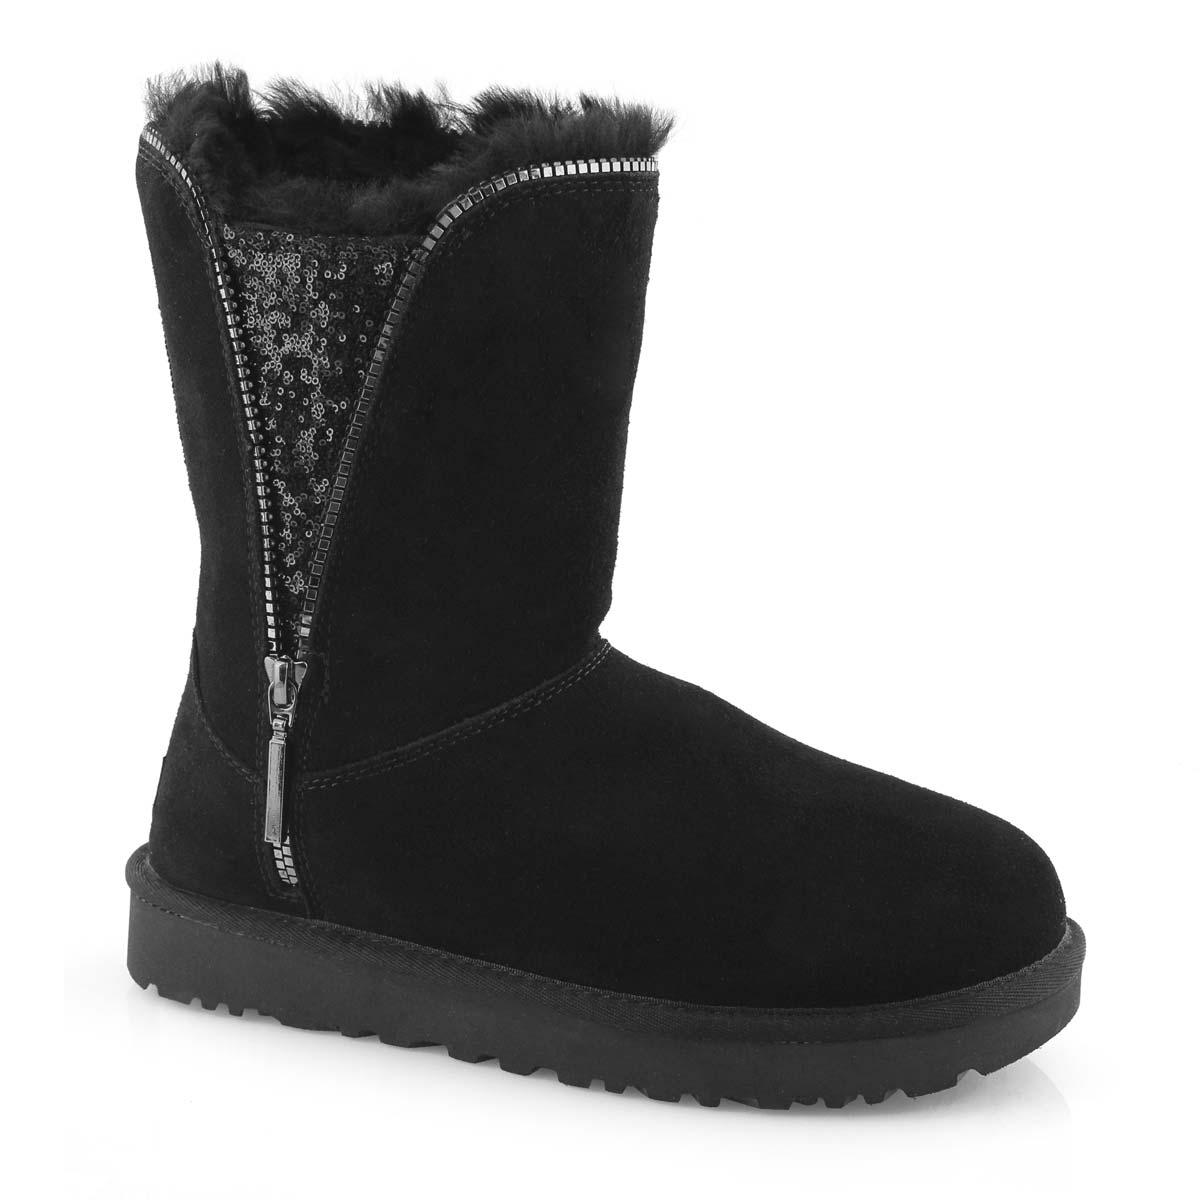 Women's CLASSIC ZIP black sheepskin boots